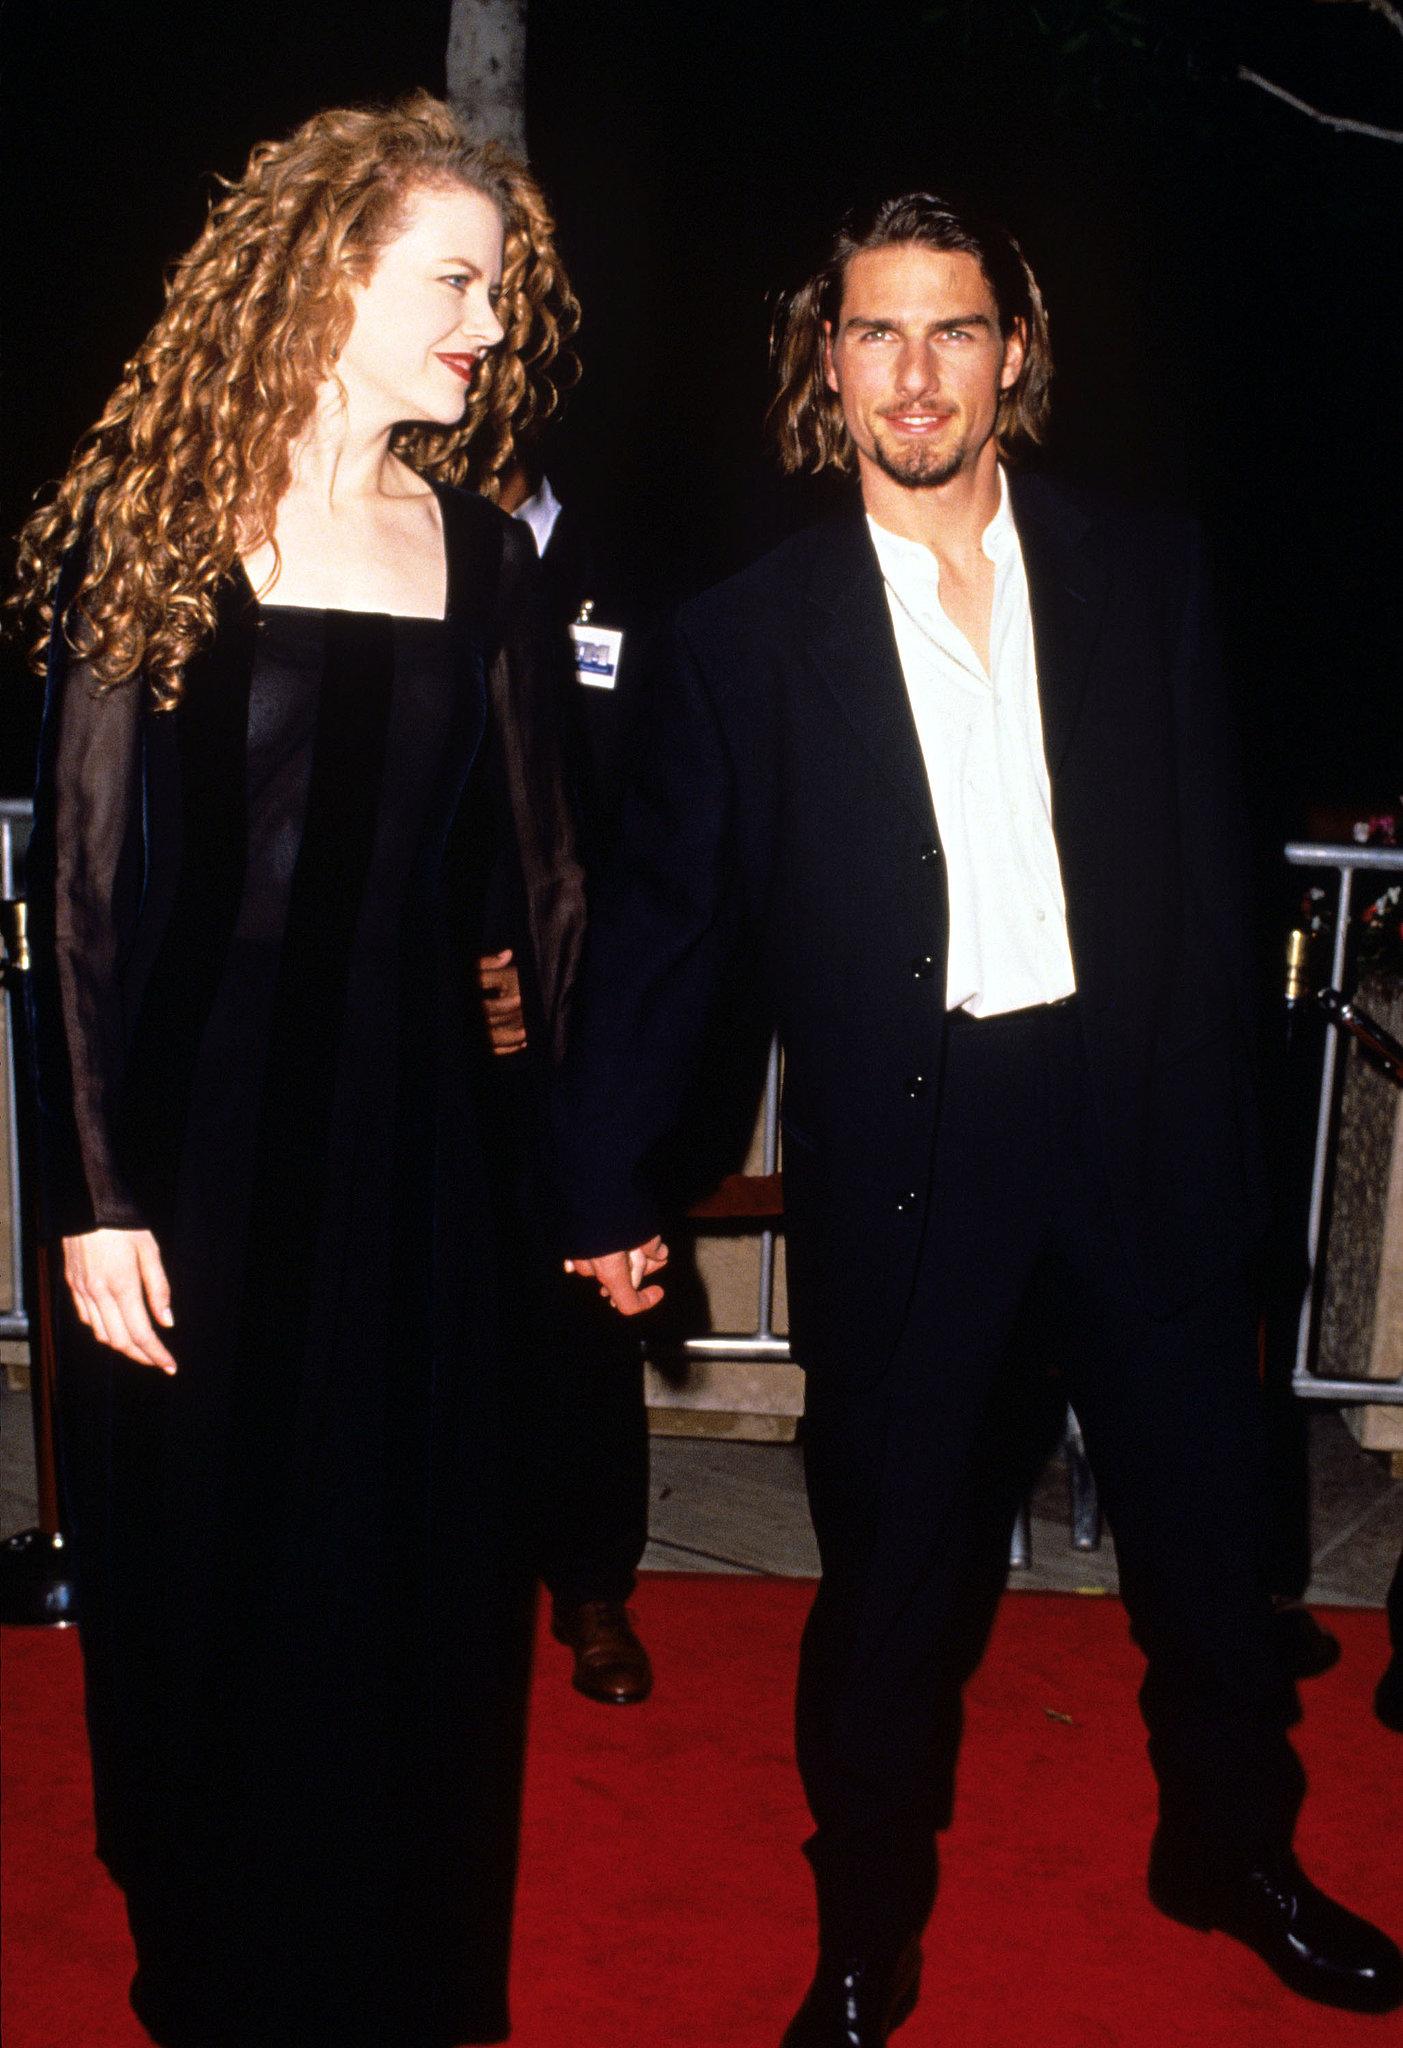 In November 1994, Tom Cruise showed off his long locks with Nicole Kidman.